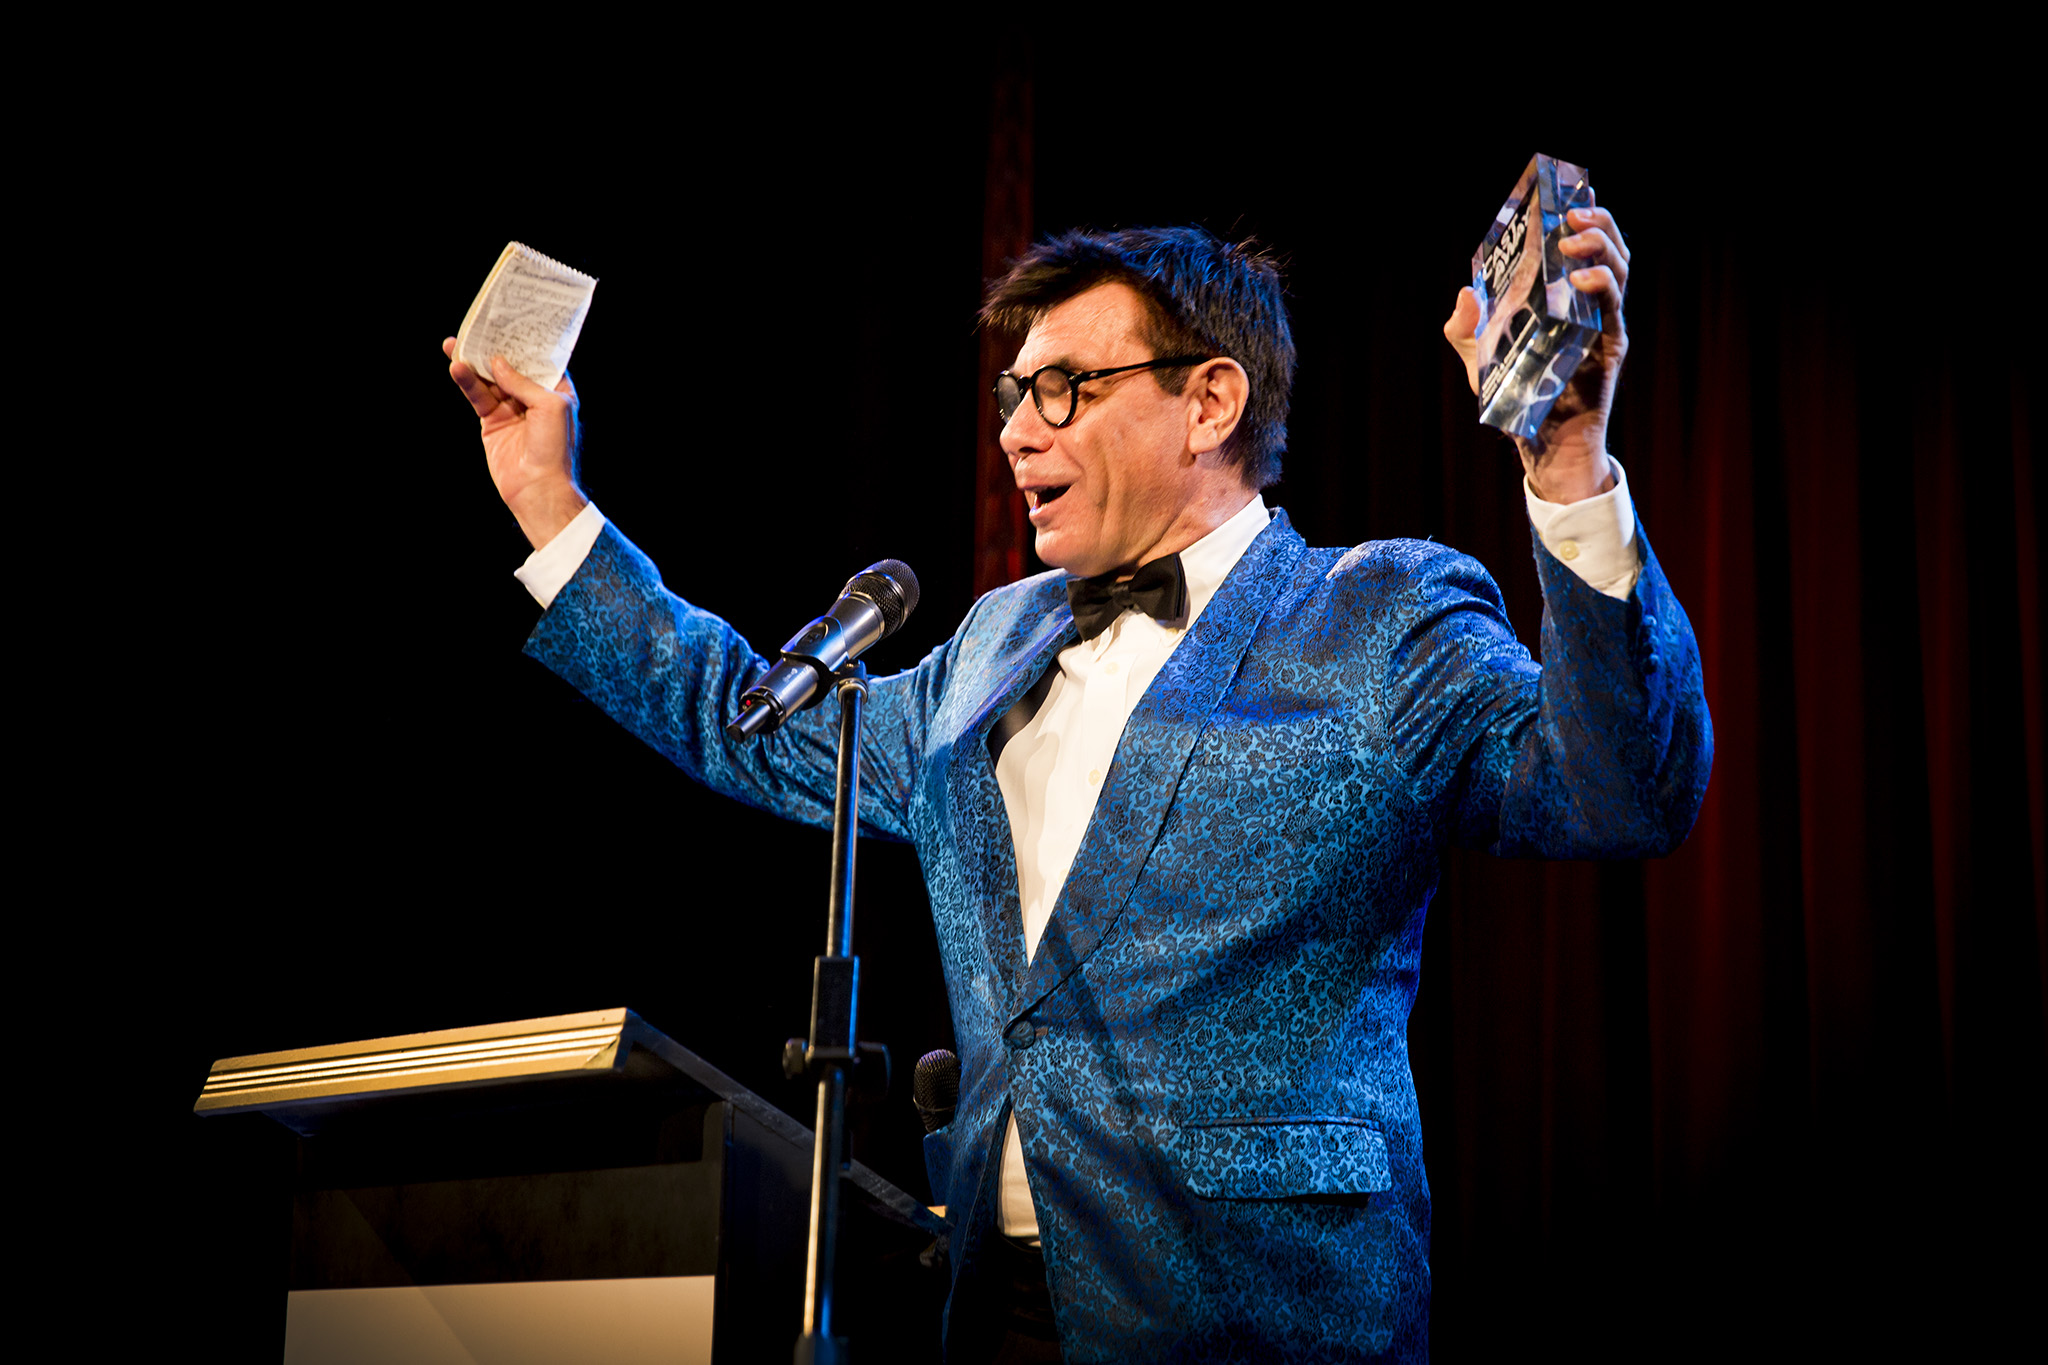 Maynard during the 2017 Australian Podcast Awards (AKA the 'Cast Away Awards')